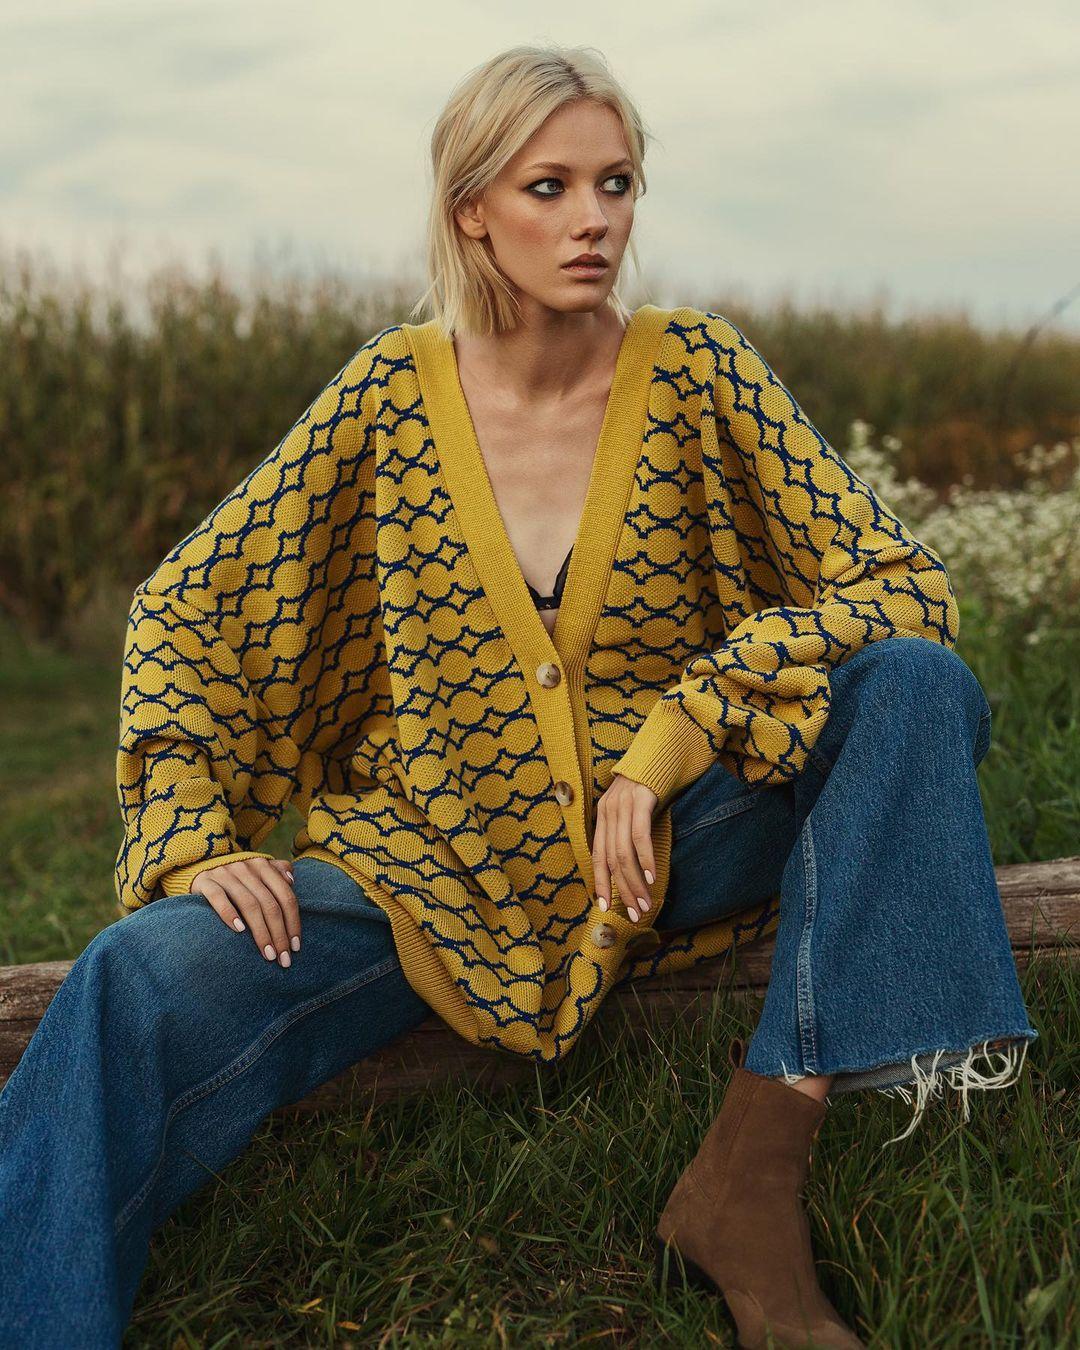 модный кардиган осень зима 2021 украинский бренд желтый оверсайз принт